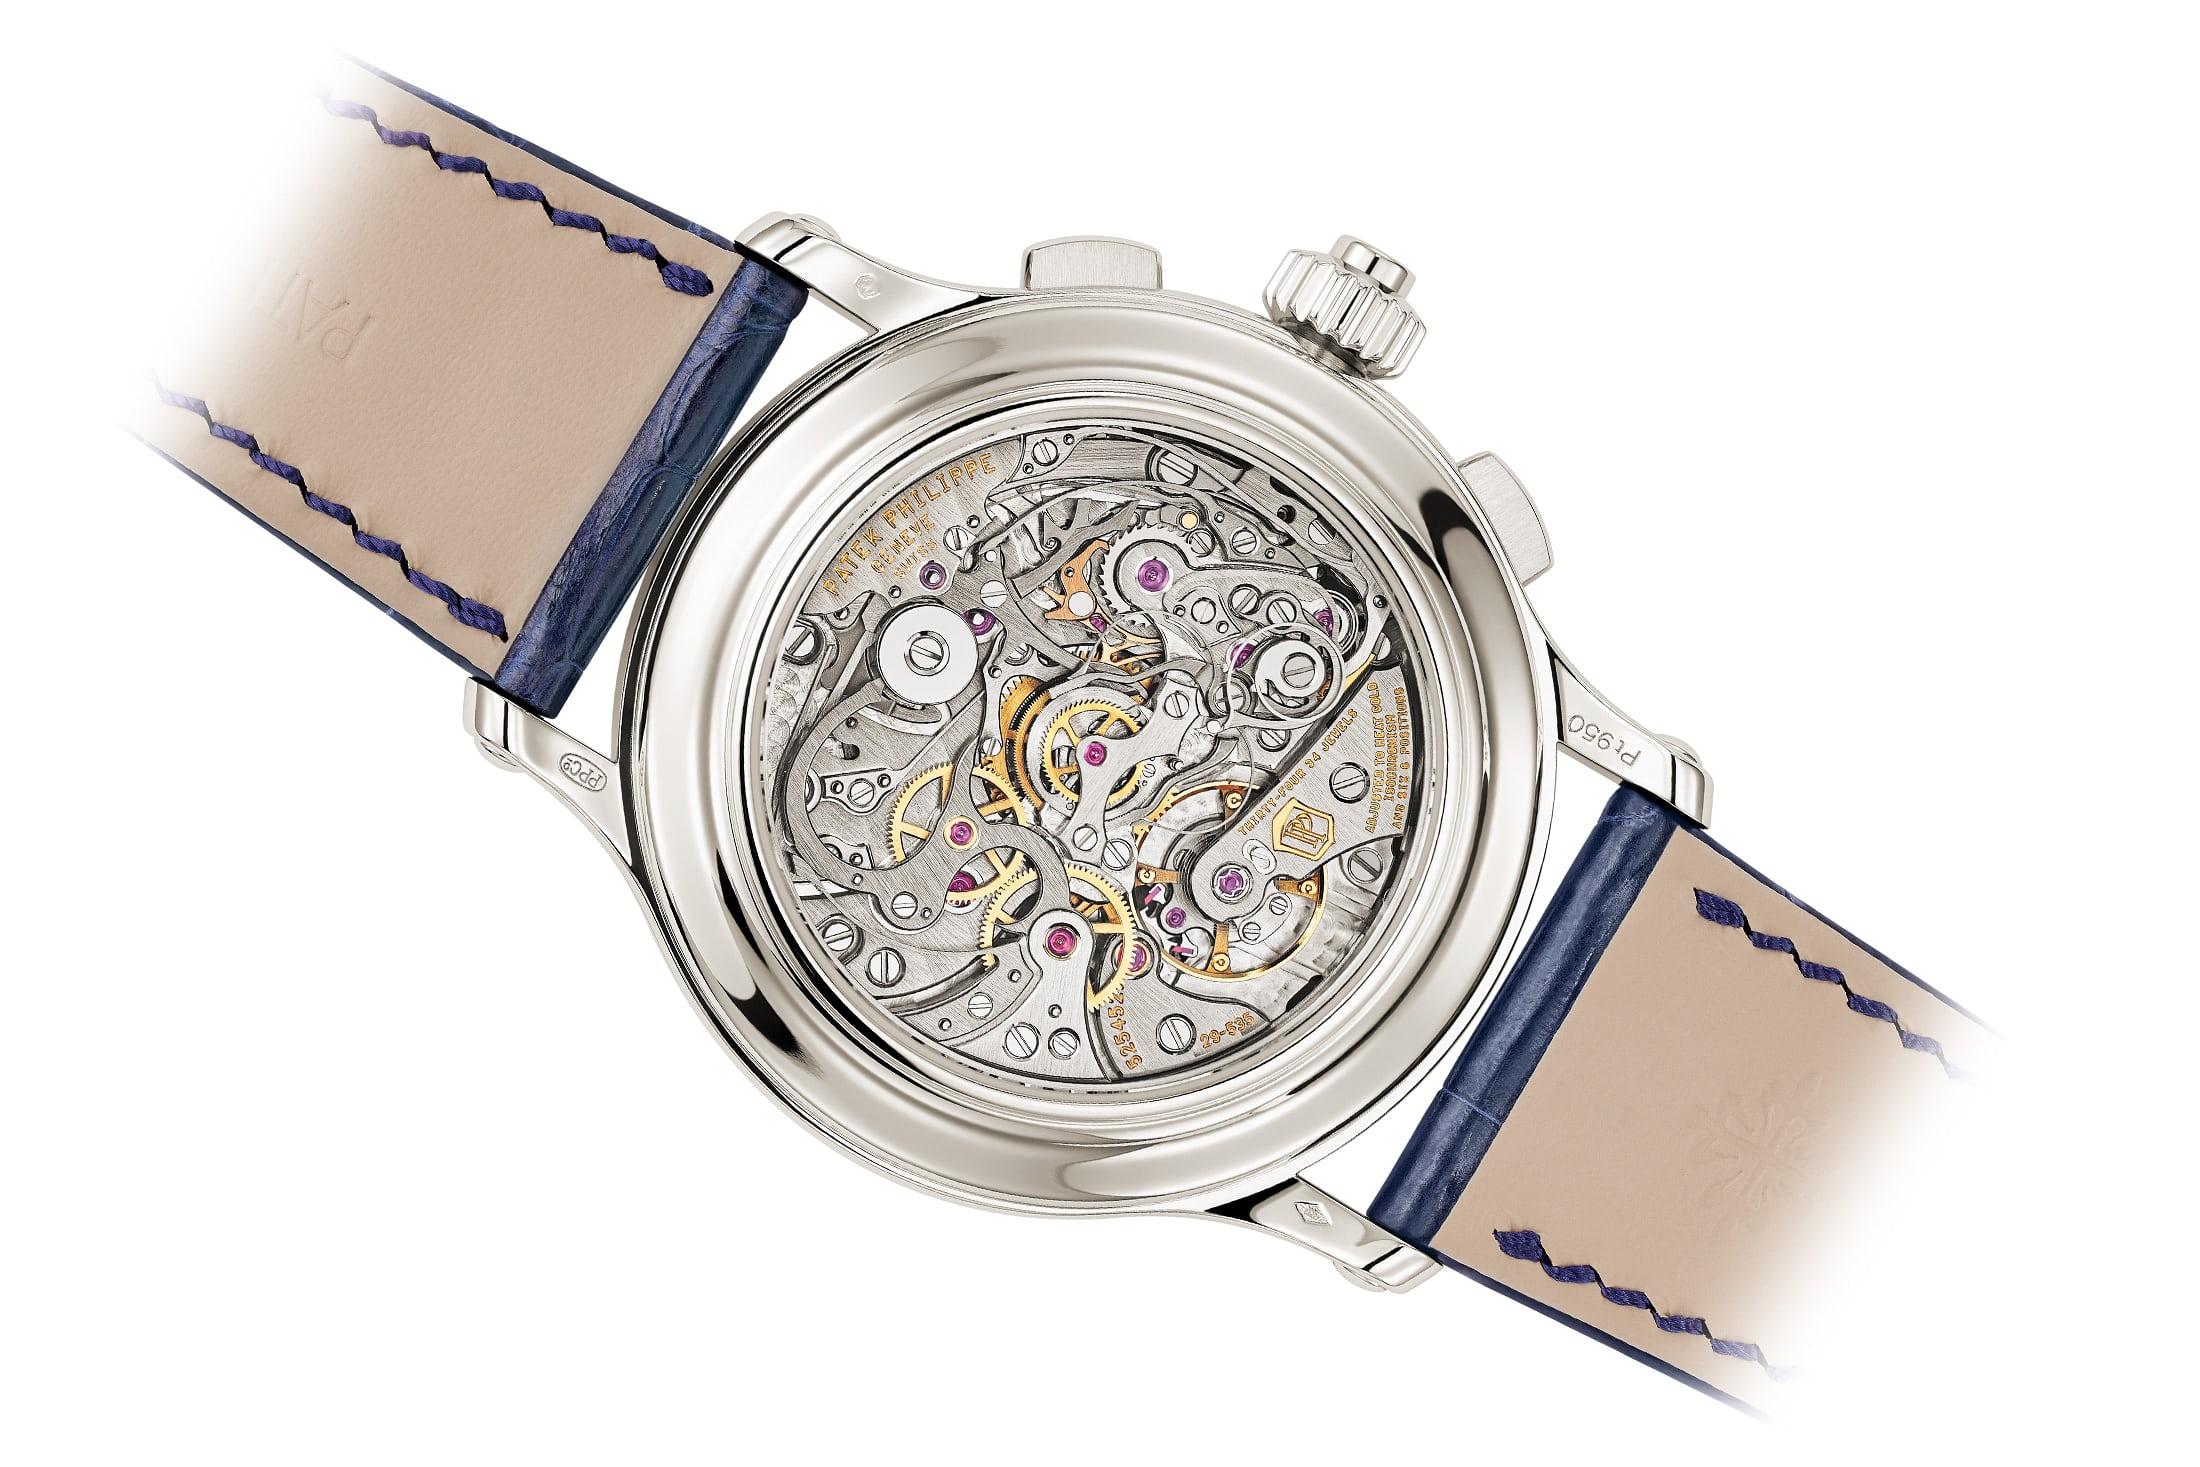 Patek Philippe Split Seconds Chronograph Ref 5370P fondo